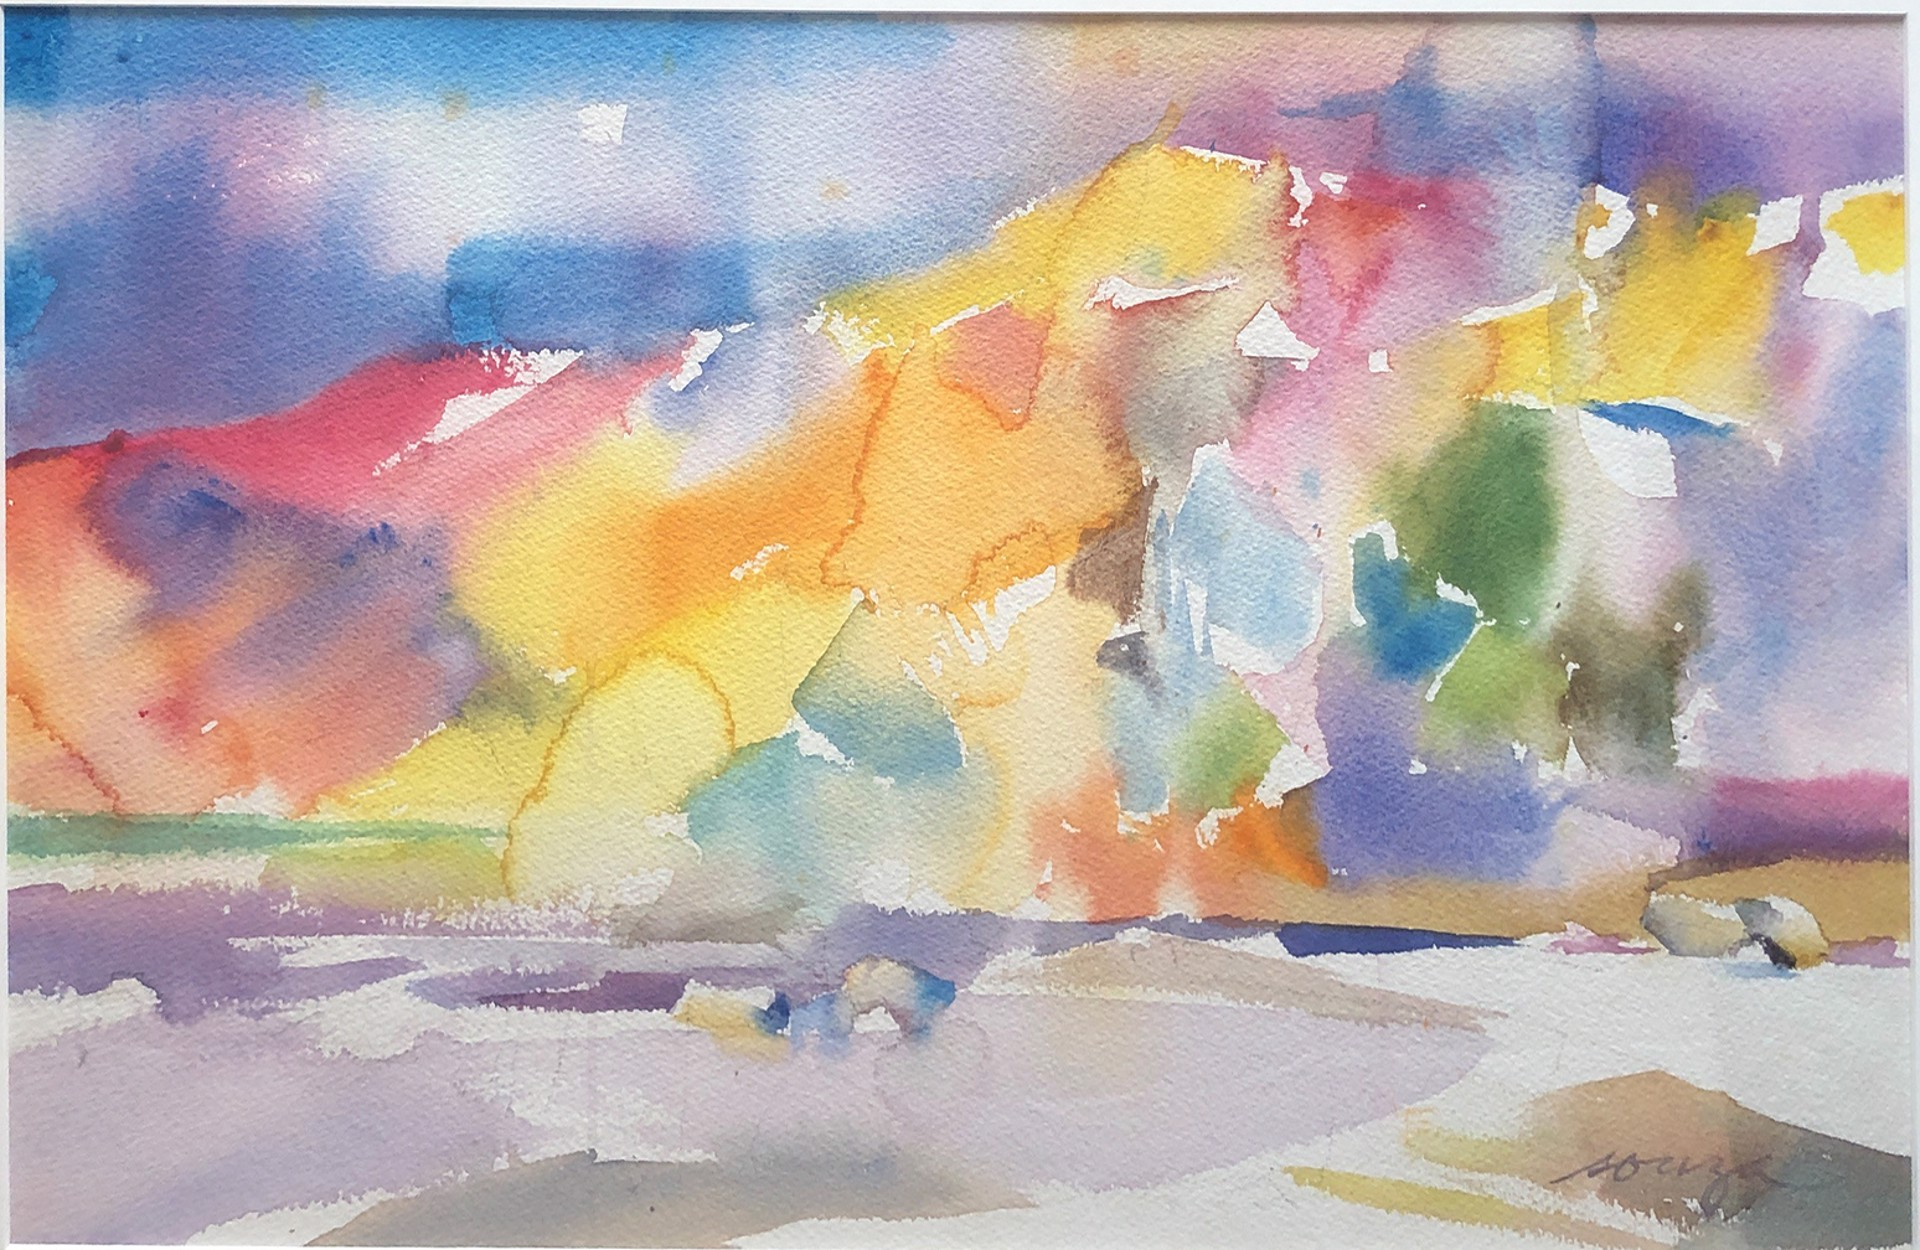 Desert Bloom by Paul Souza